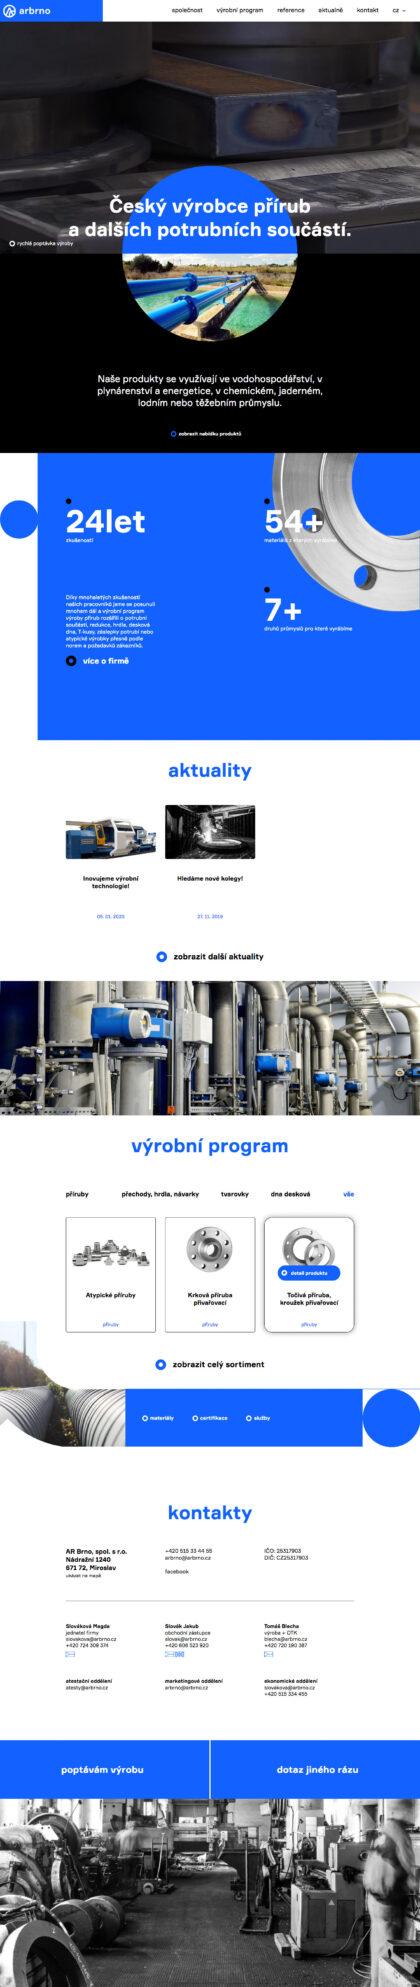 AR Brno - realizace, Web design